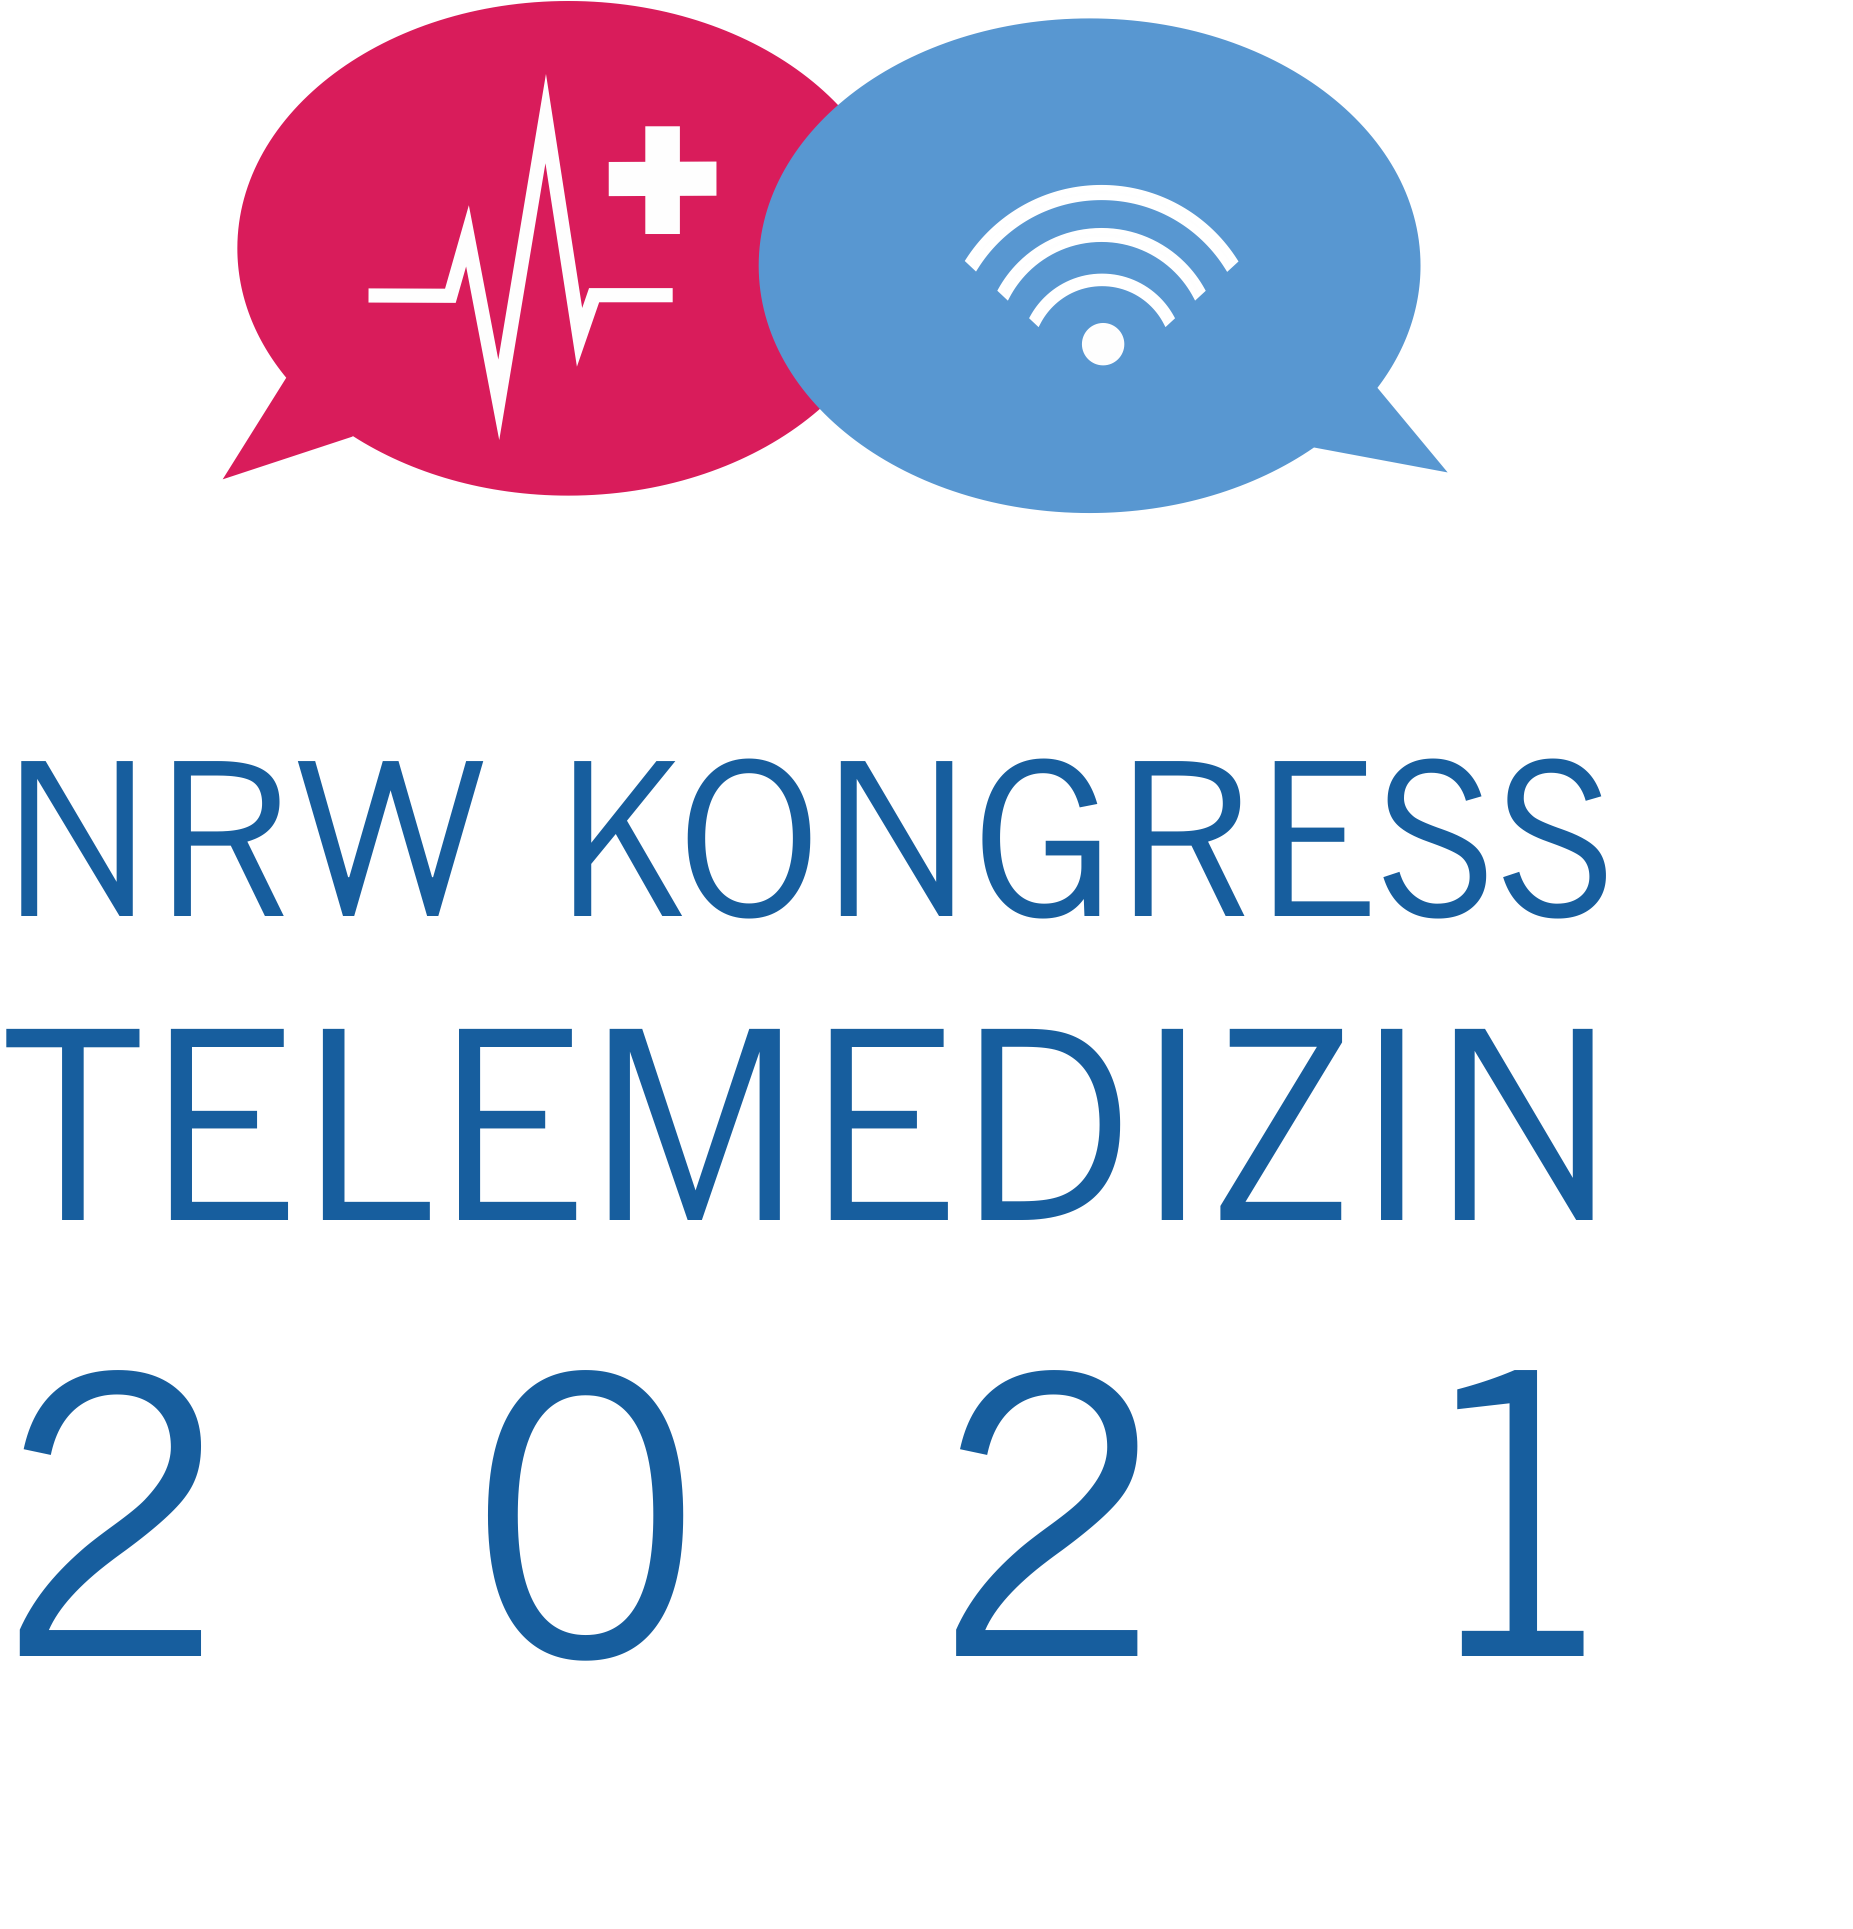 NRW-Kongress Telemedizin